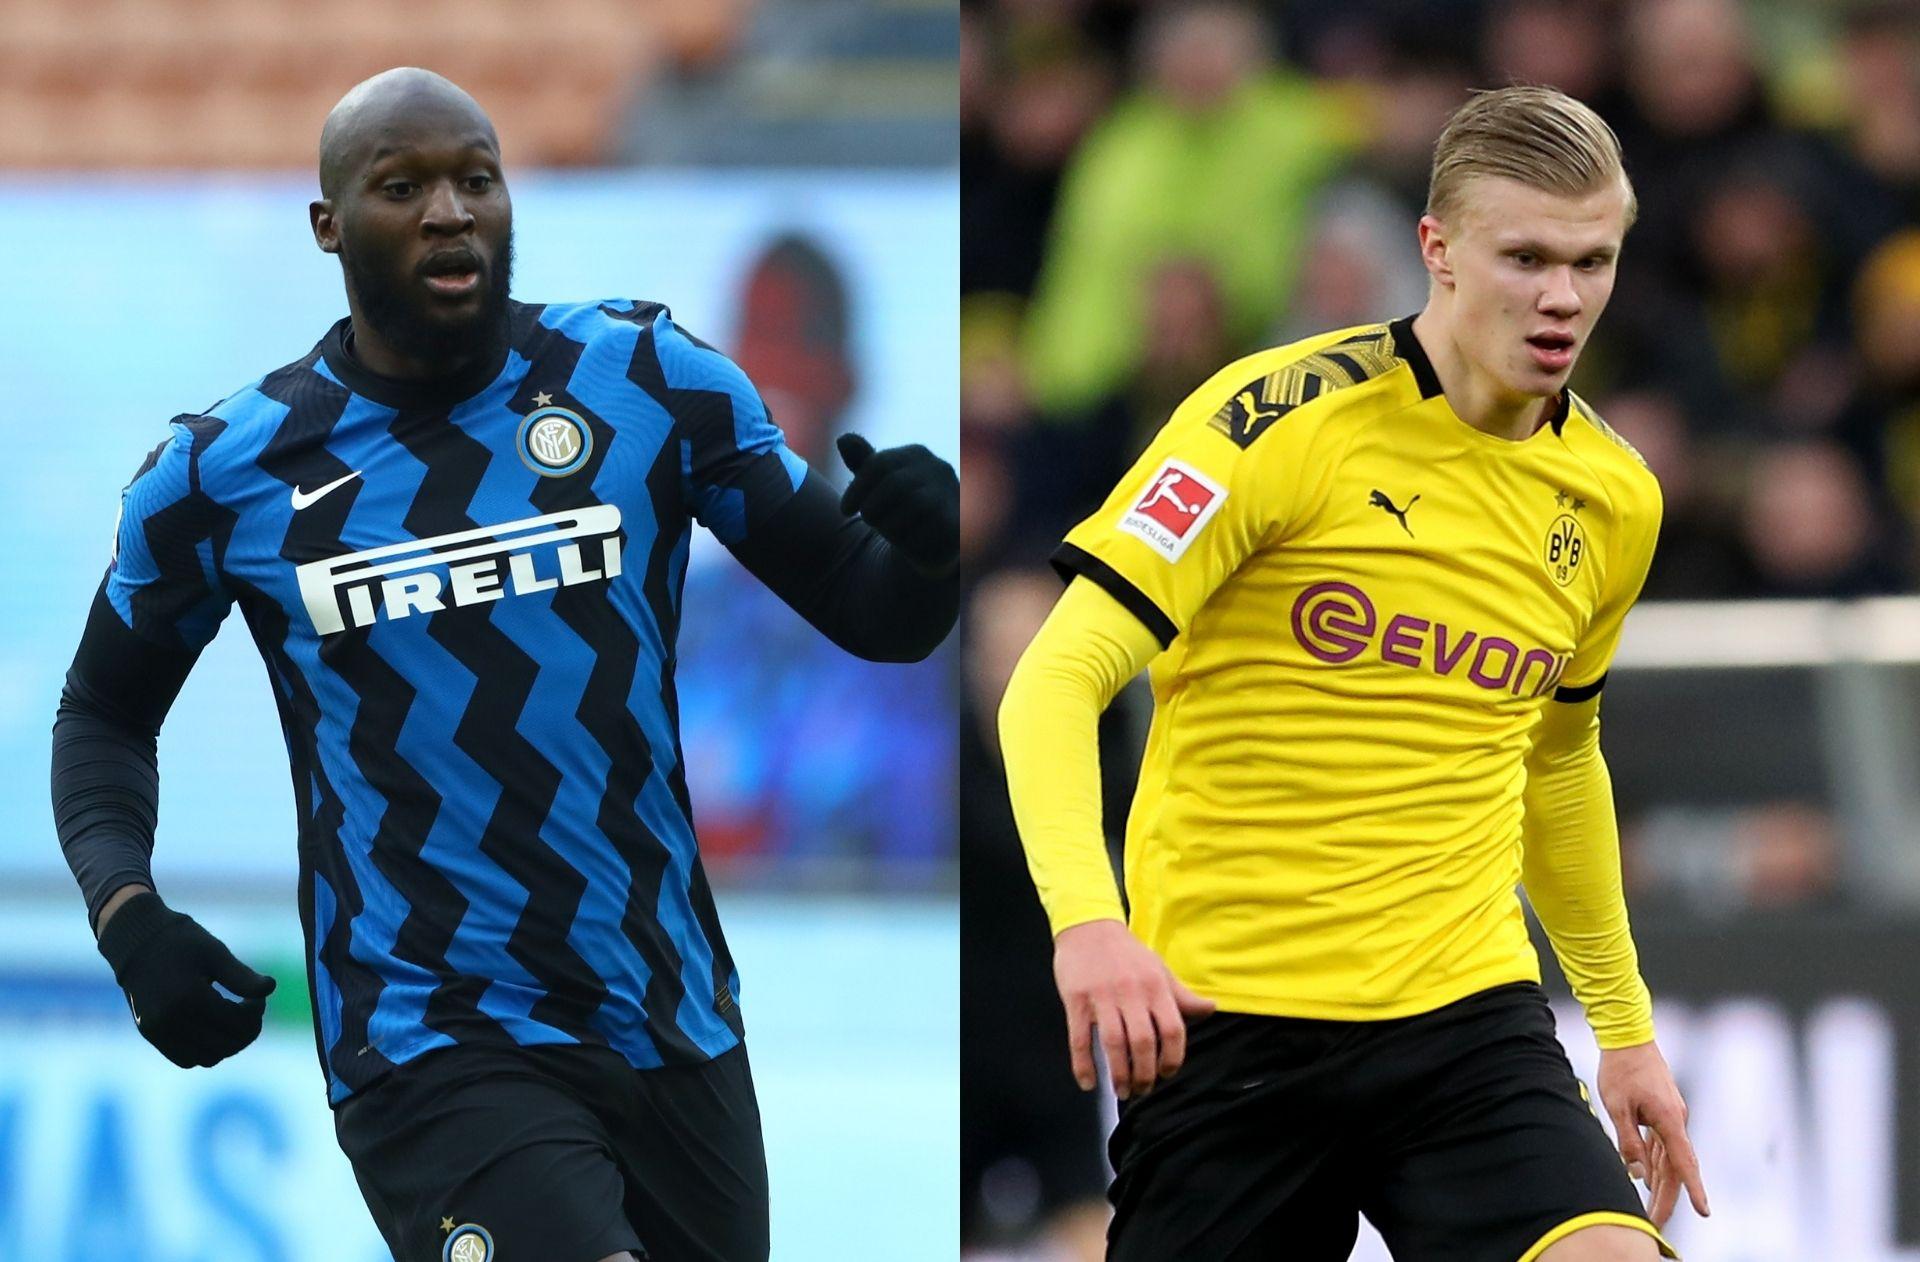 Romelu Lukaku of Inter Milan, Erling Haaland of Borussia Dortmund